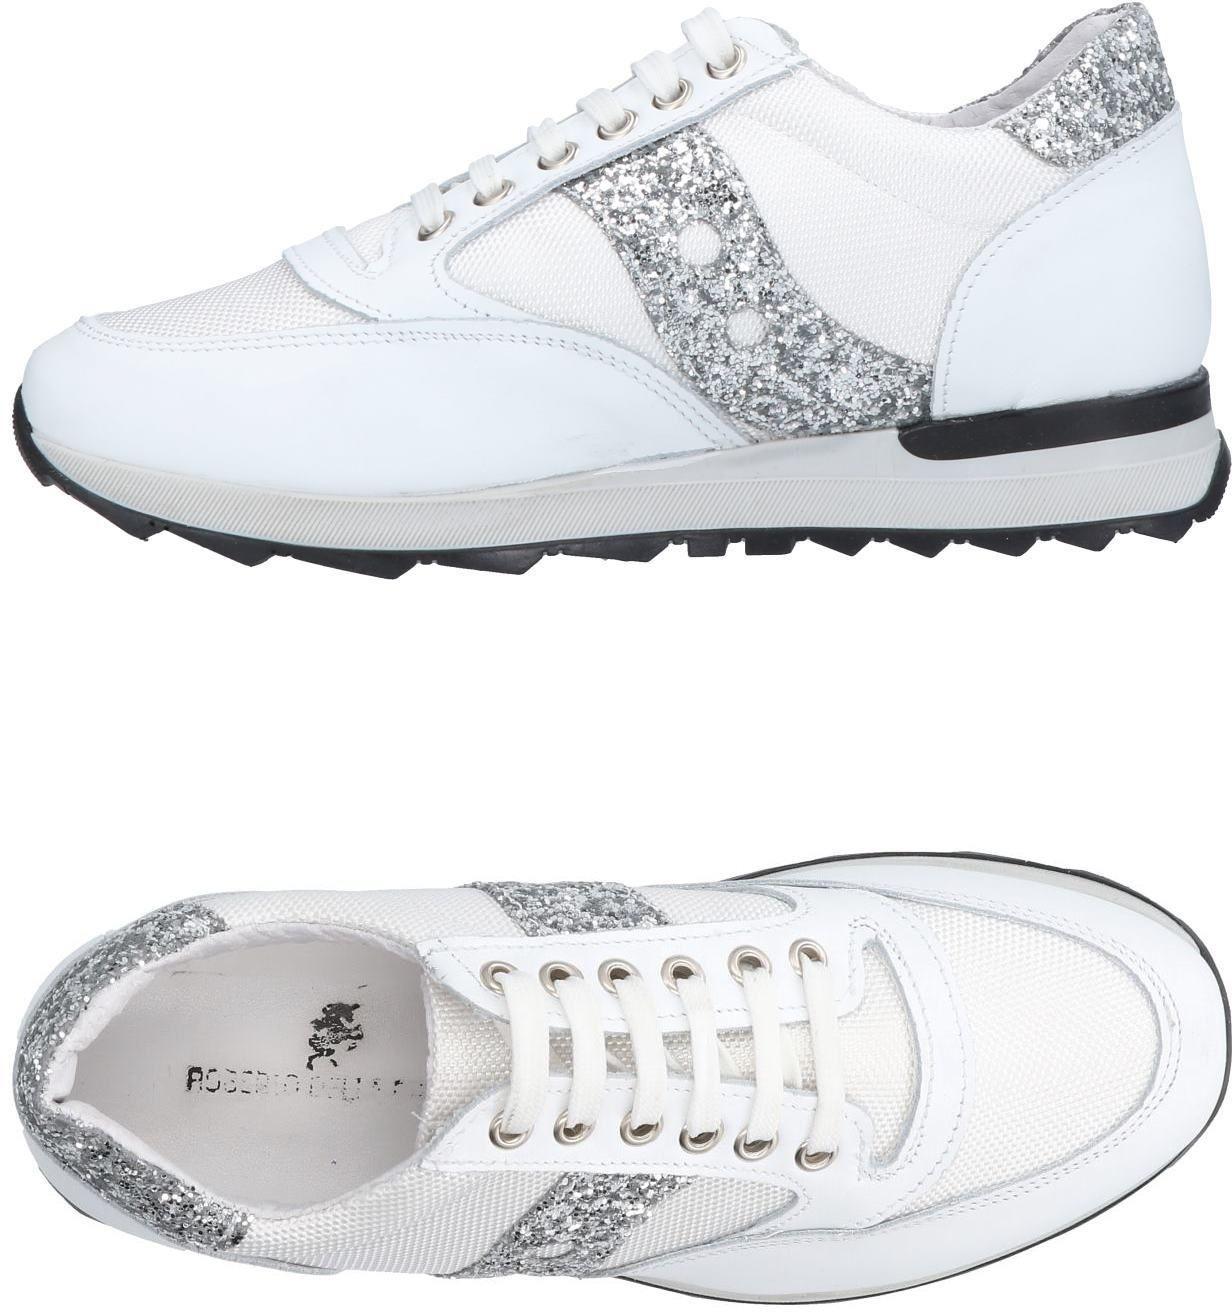 Sneakersamp; Tennis Calzature Della Basse Roberto Shoes Croce b6gyvf7Y